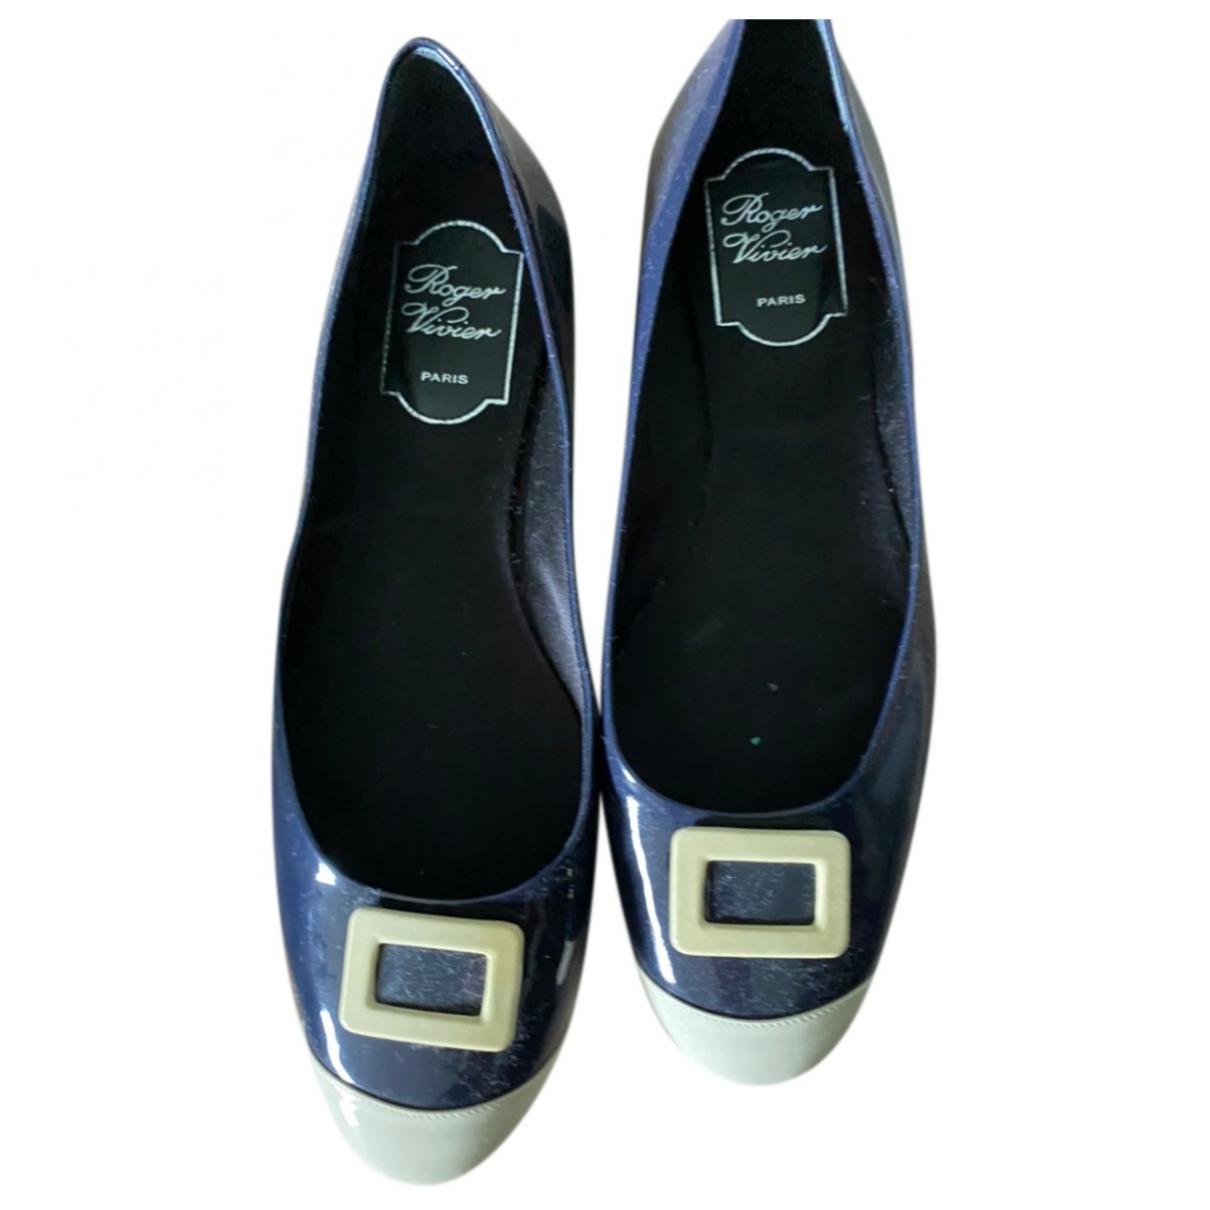 Roger Vivier \N Navy Patent leather Flats for Women 37.5 EU